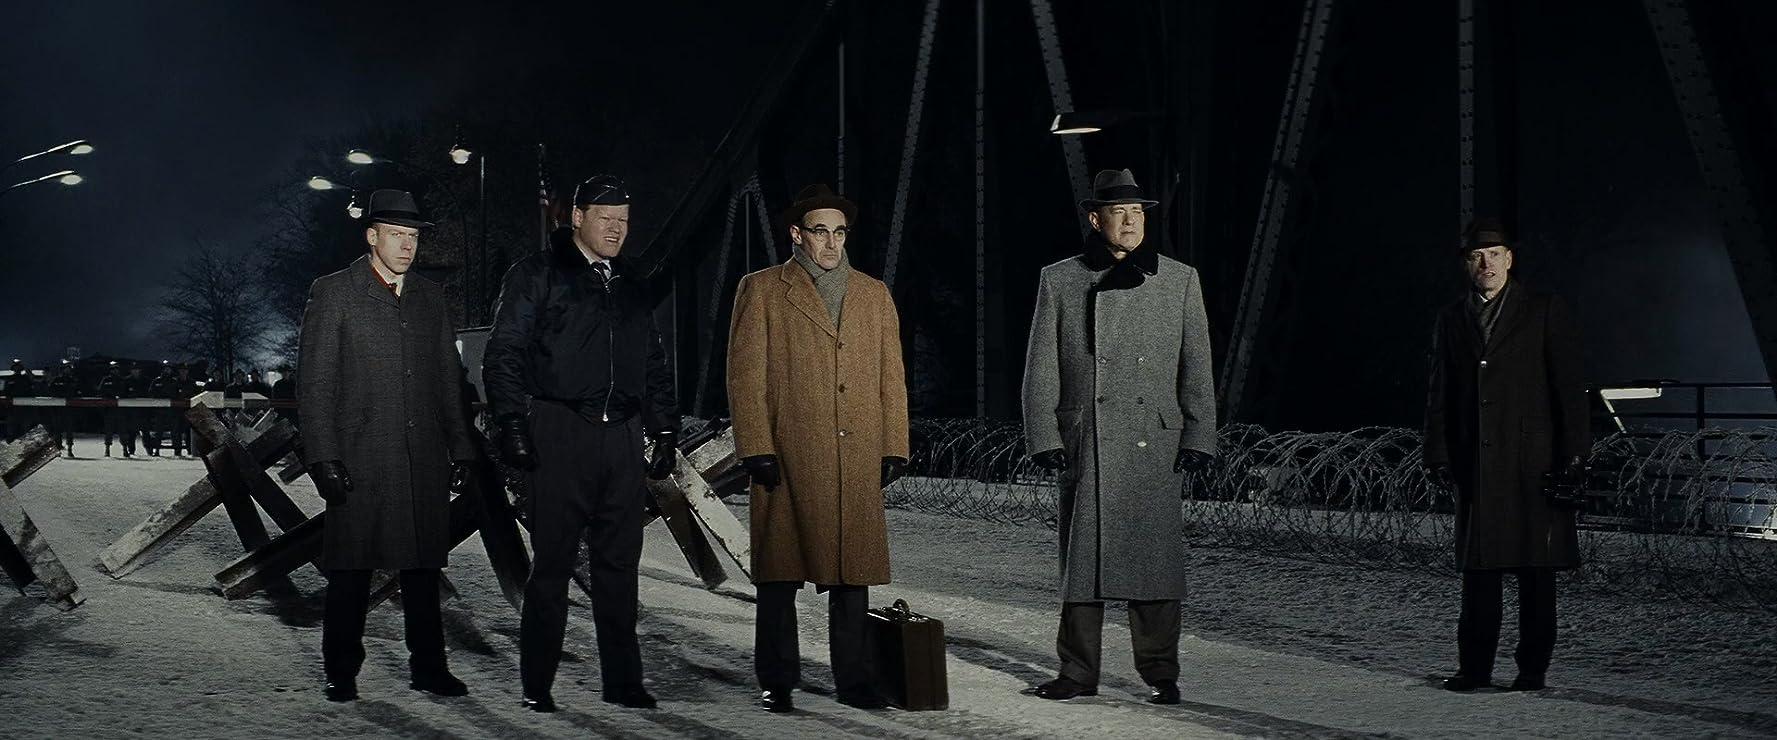 Tom Hanks, Jesse Plemons, Mark Rylance, and Scott Shepherd in Bridge of Spies (2015)